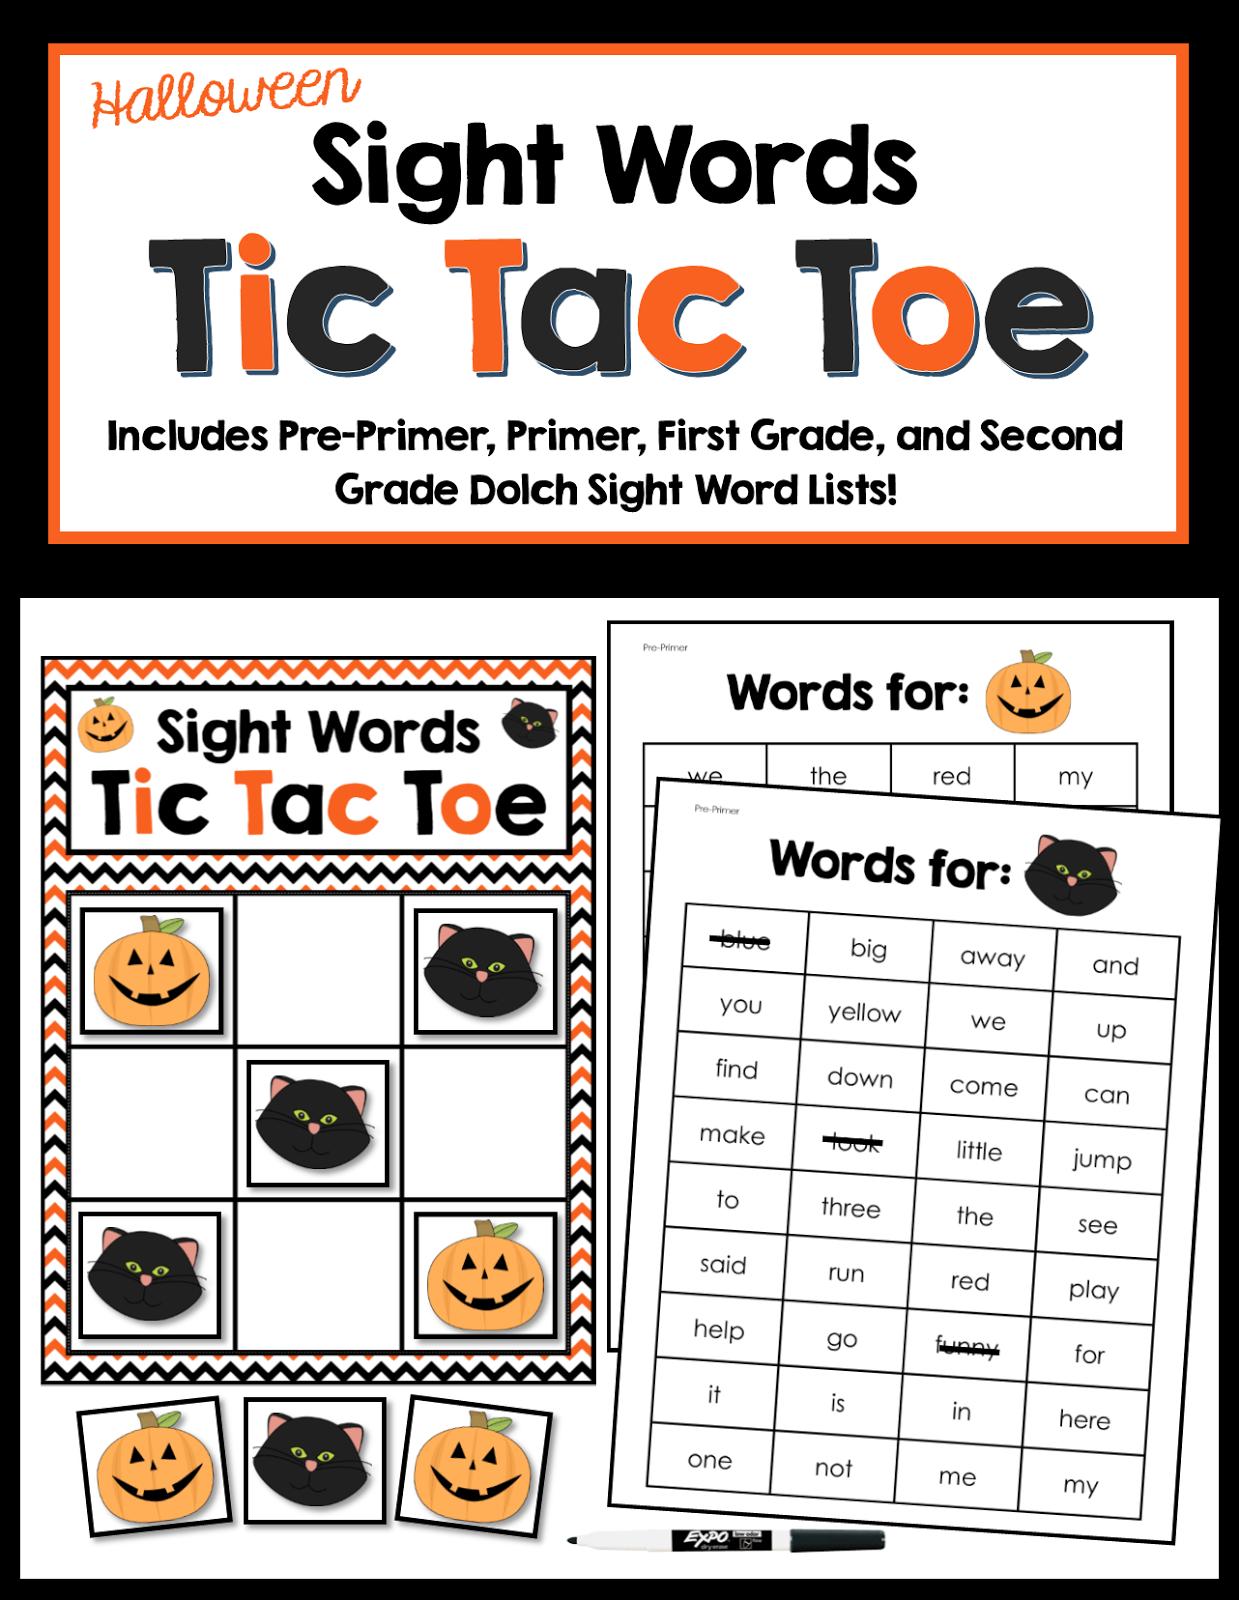 Halloween Halloween Sight Words Freebie And Games For Sight Words Cvc Words And Cvce Words